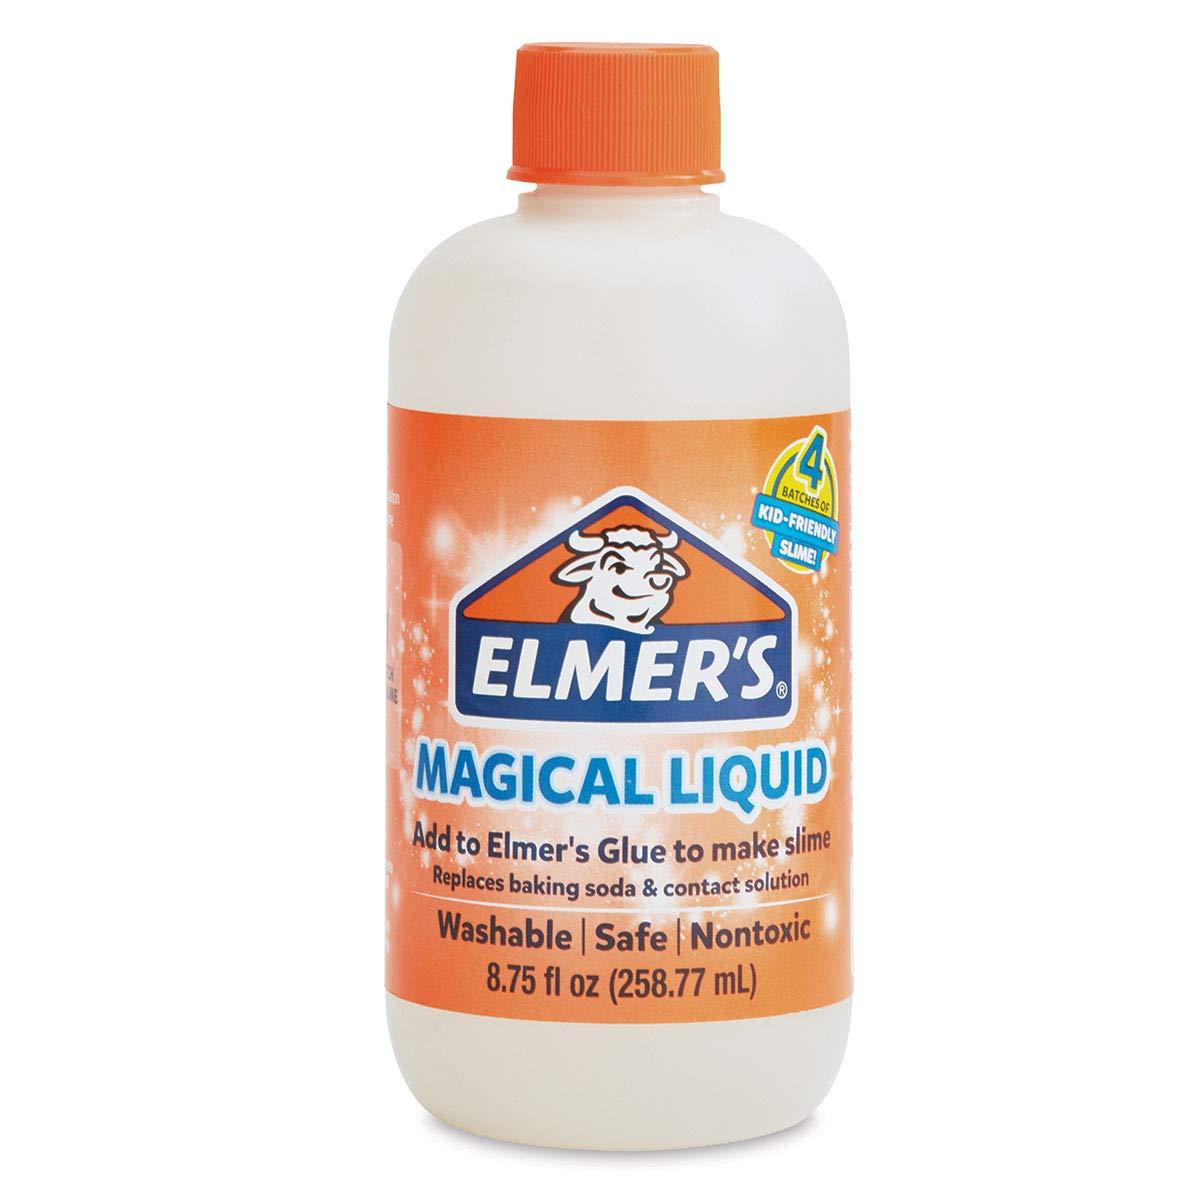 Elmers/X-Acto Elmer's Crunchy Magical Liquid 1 Batch, Multi